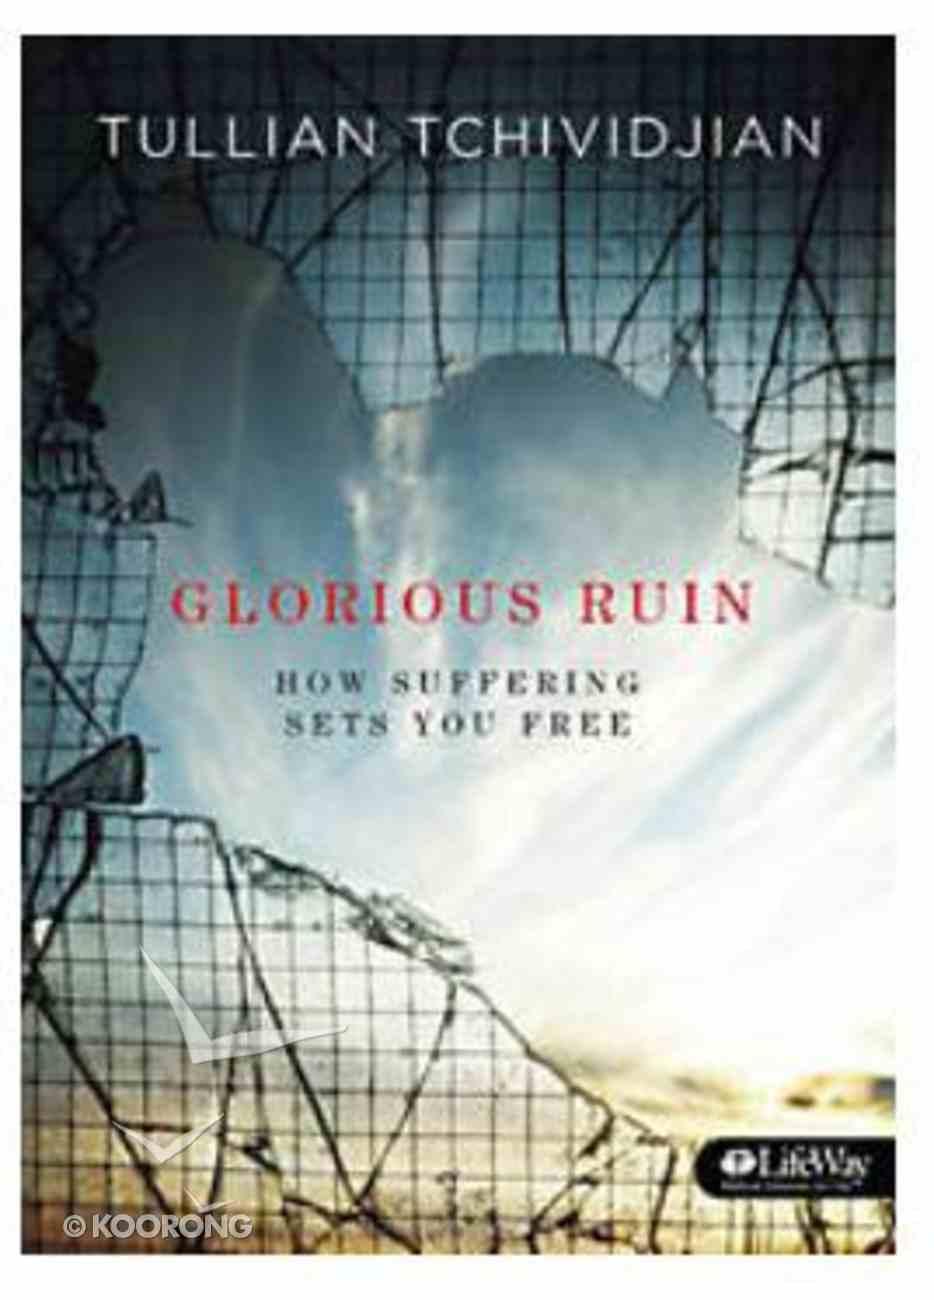 Glorious Ruin (Dvd) DVD